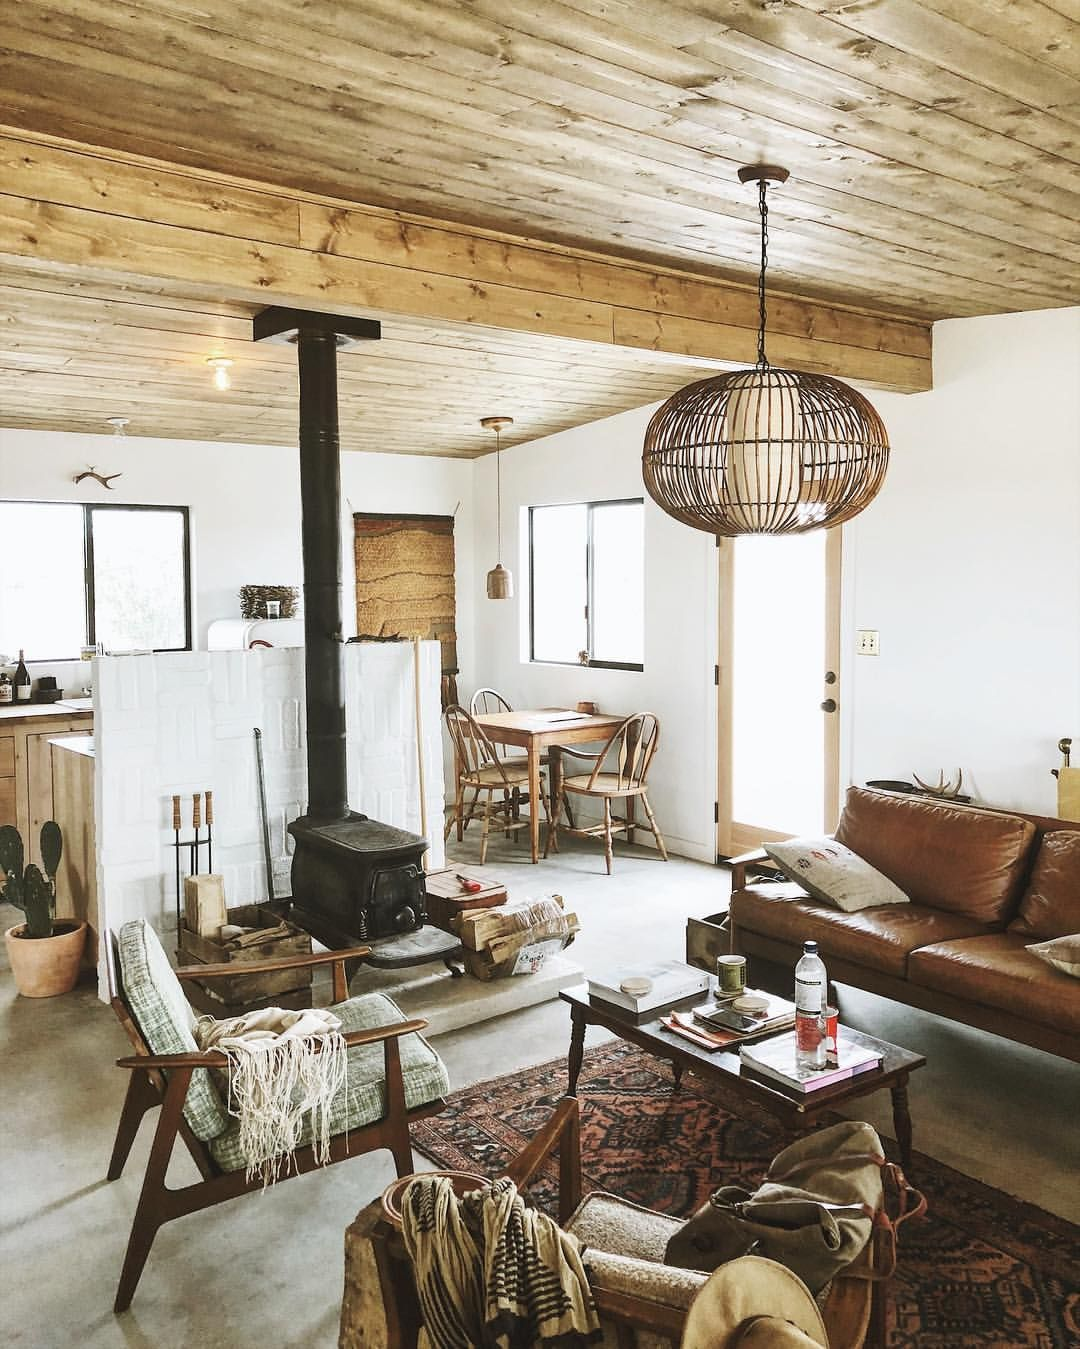 Desert Homes Apartments: Pin By Natalie Mauro On Desert Home